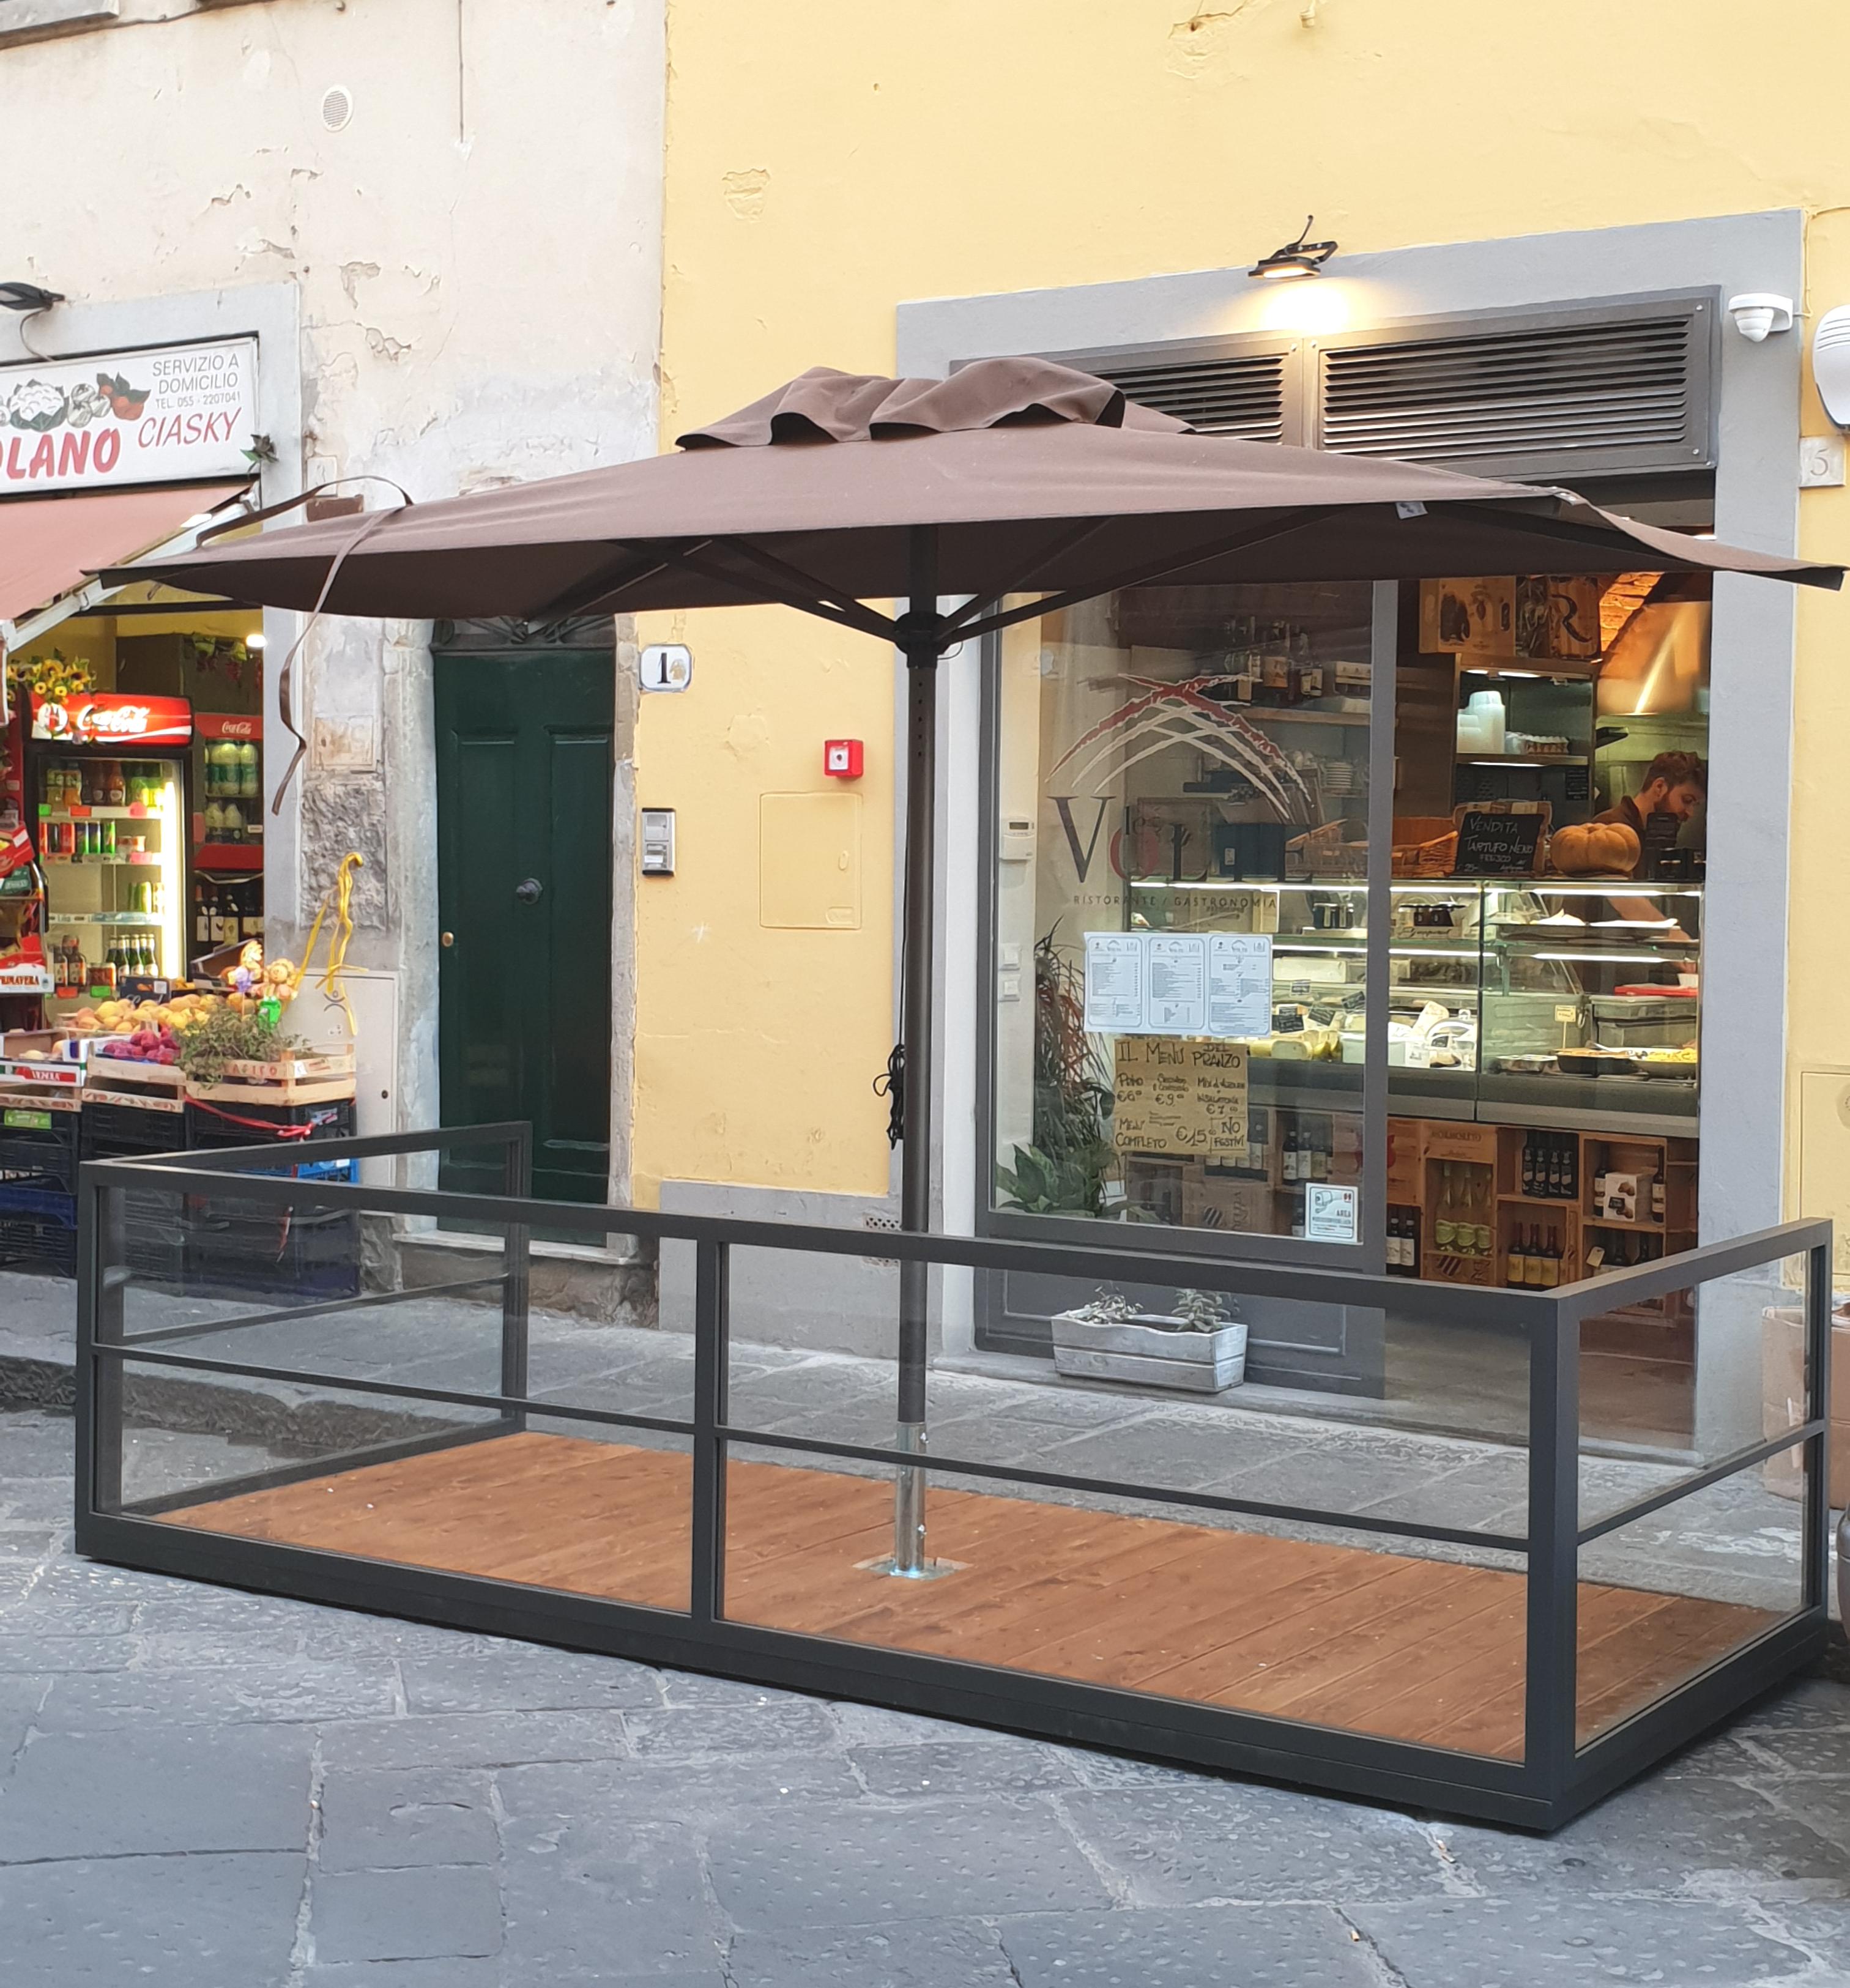 Ombrelloni Per Esterno Bar.Ombrelloni Da Esterno E Da Giardino Firenze Cover Df